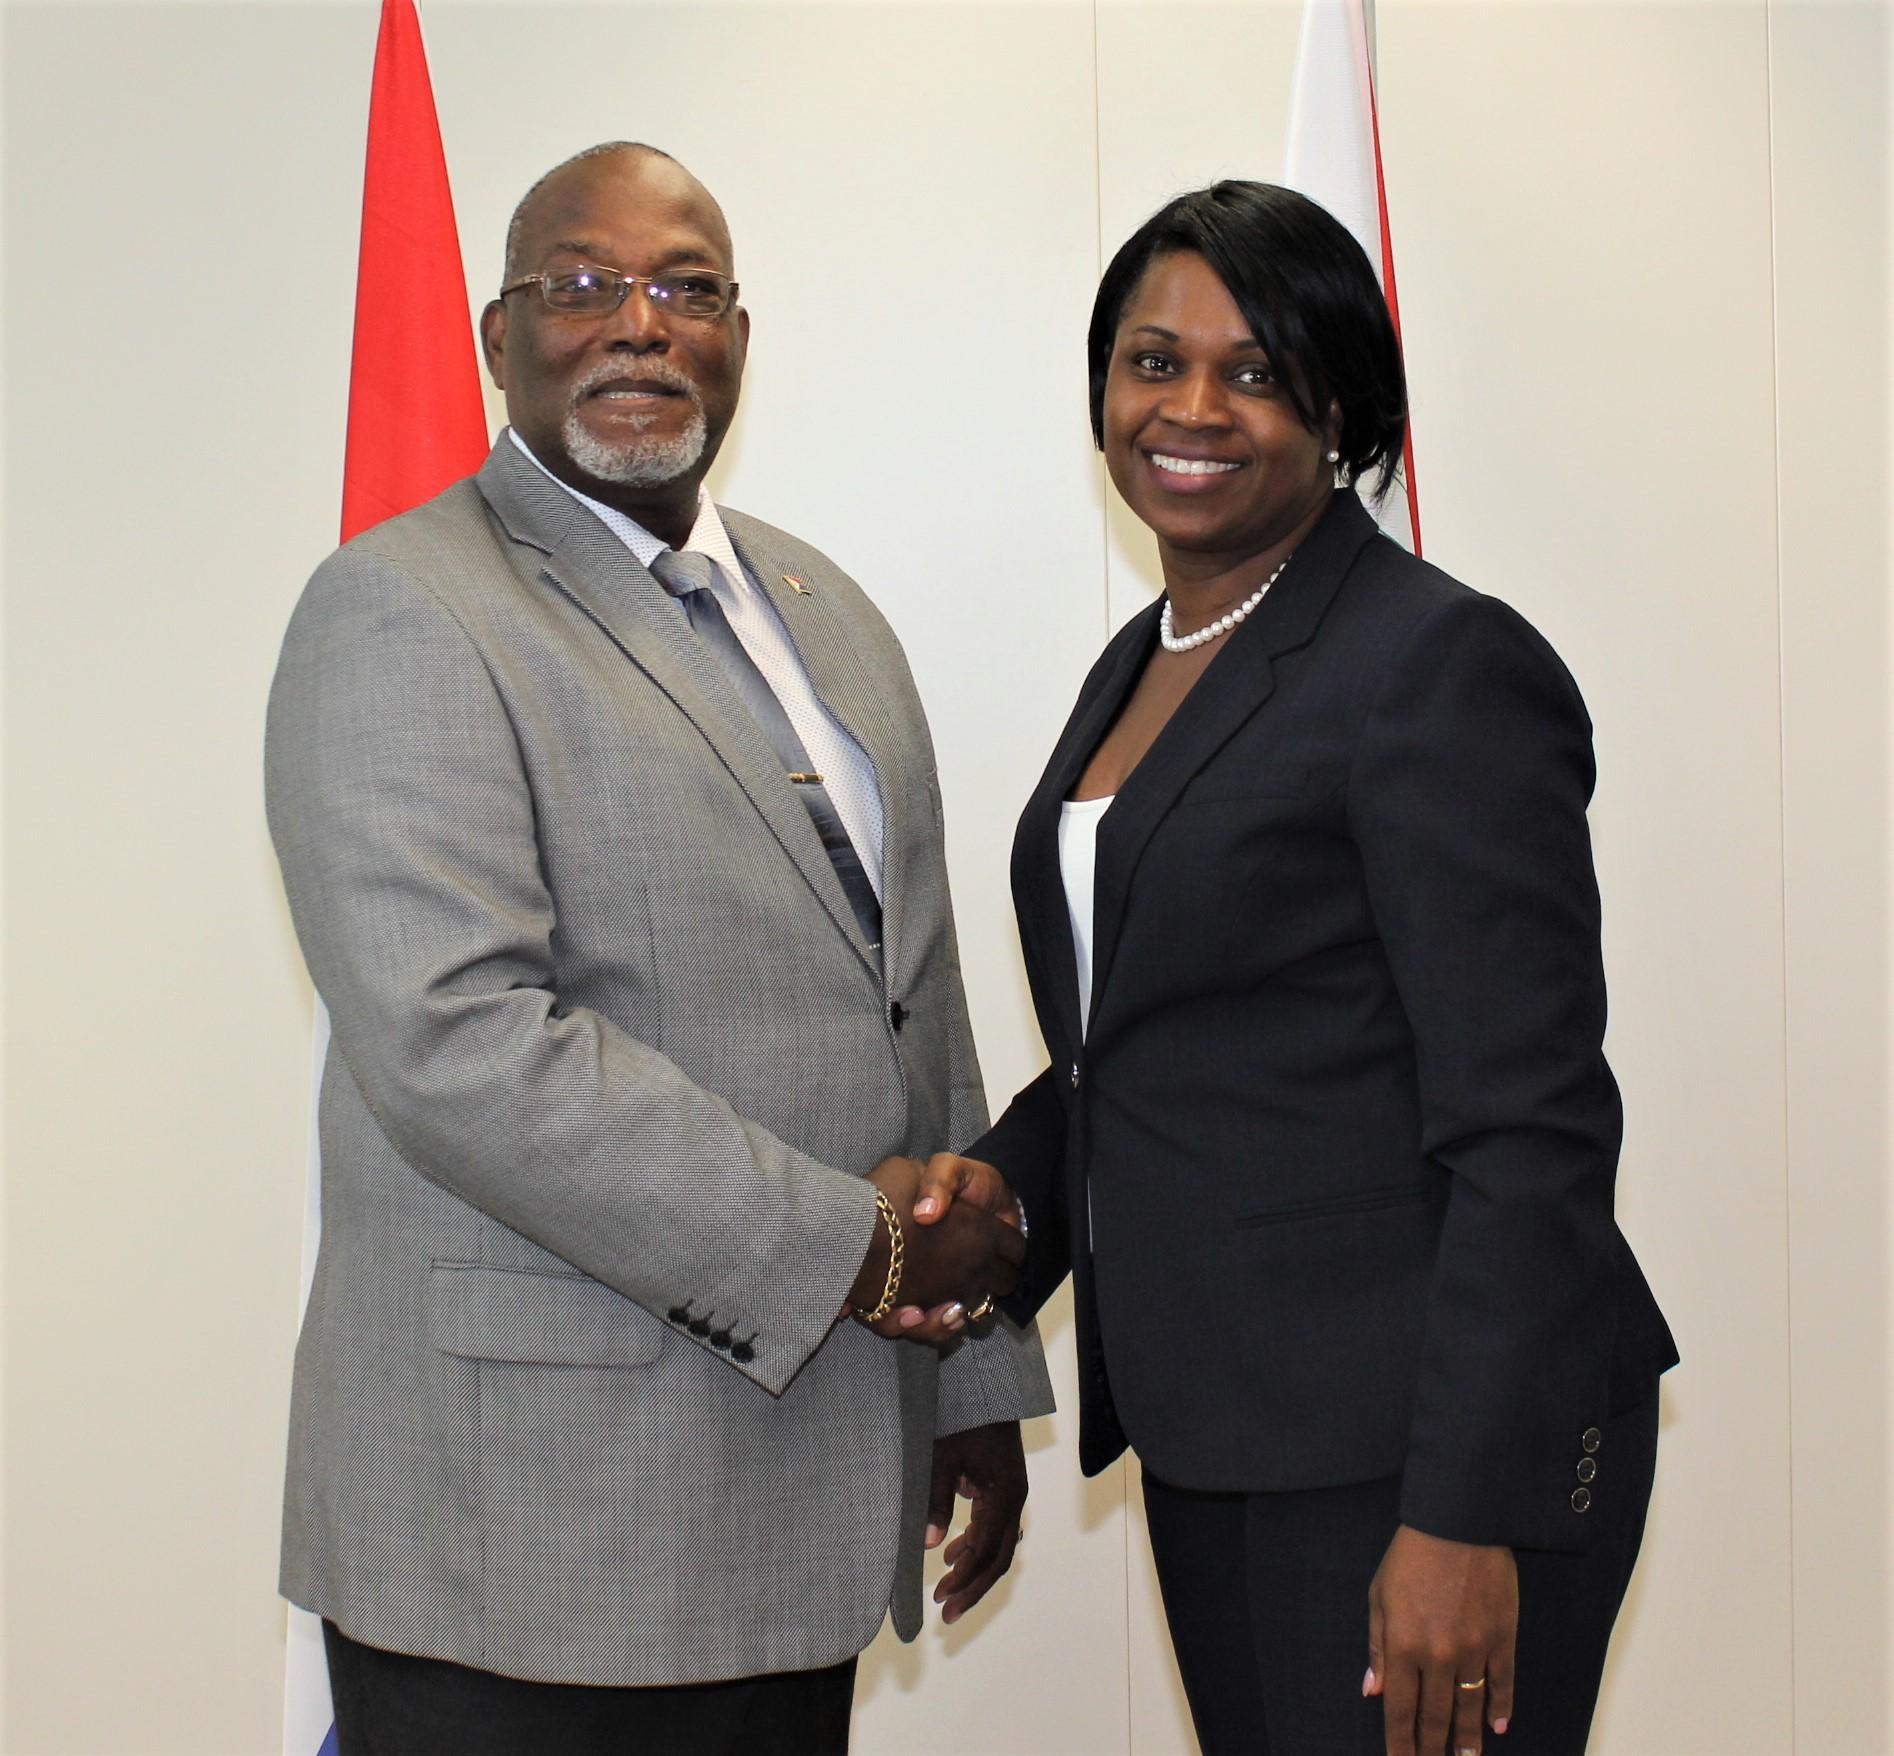 PM Leona Romeo Marlin - Rafael Boasman - Quartermaster Integrity Chamber